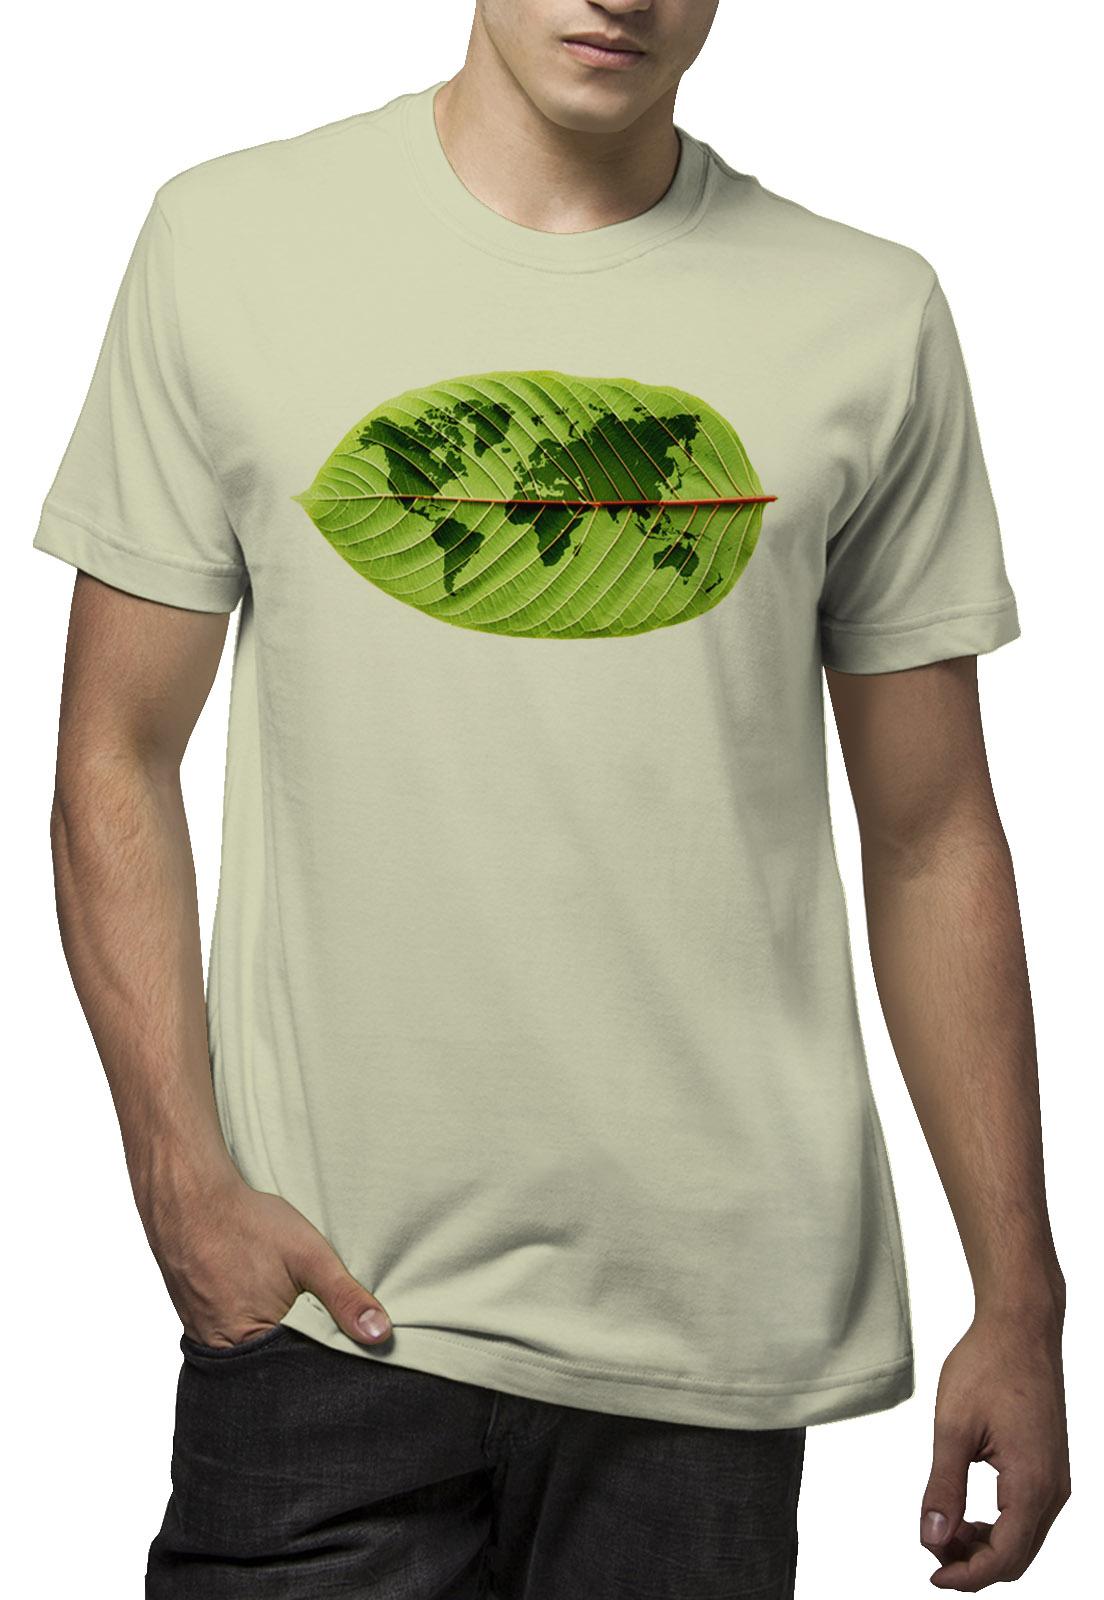 Camiseta Amazônia Mundo Folha - Verde Claro